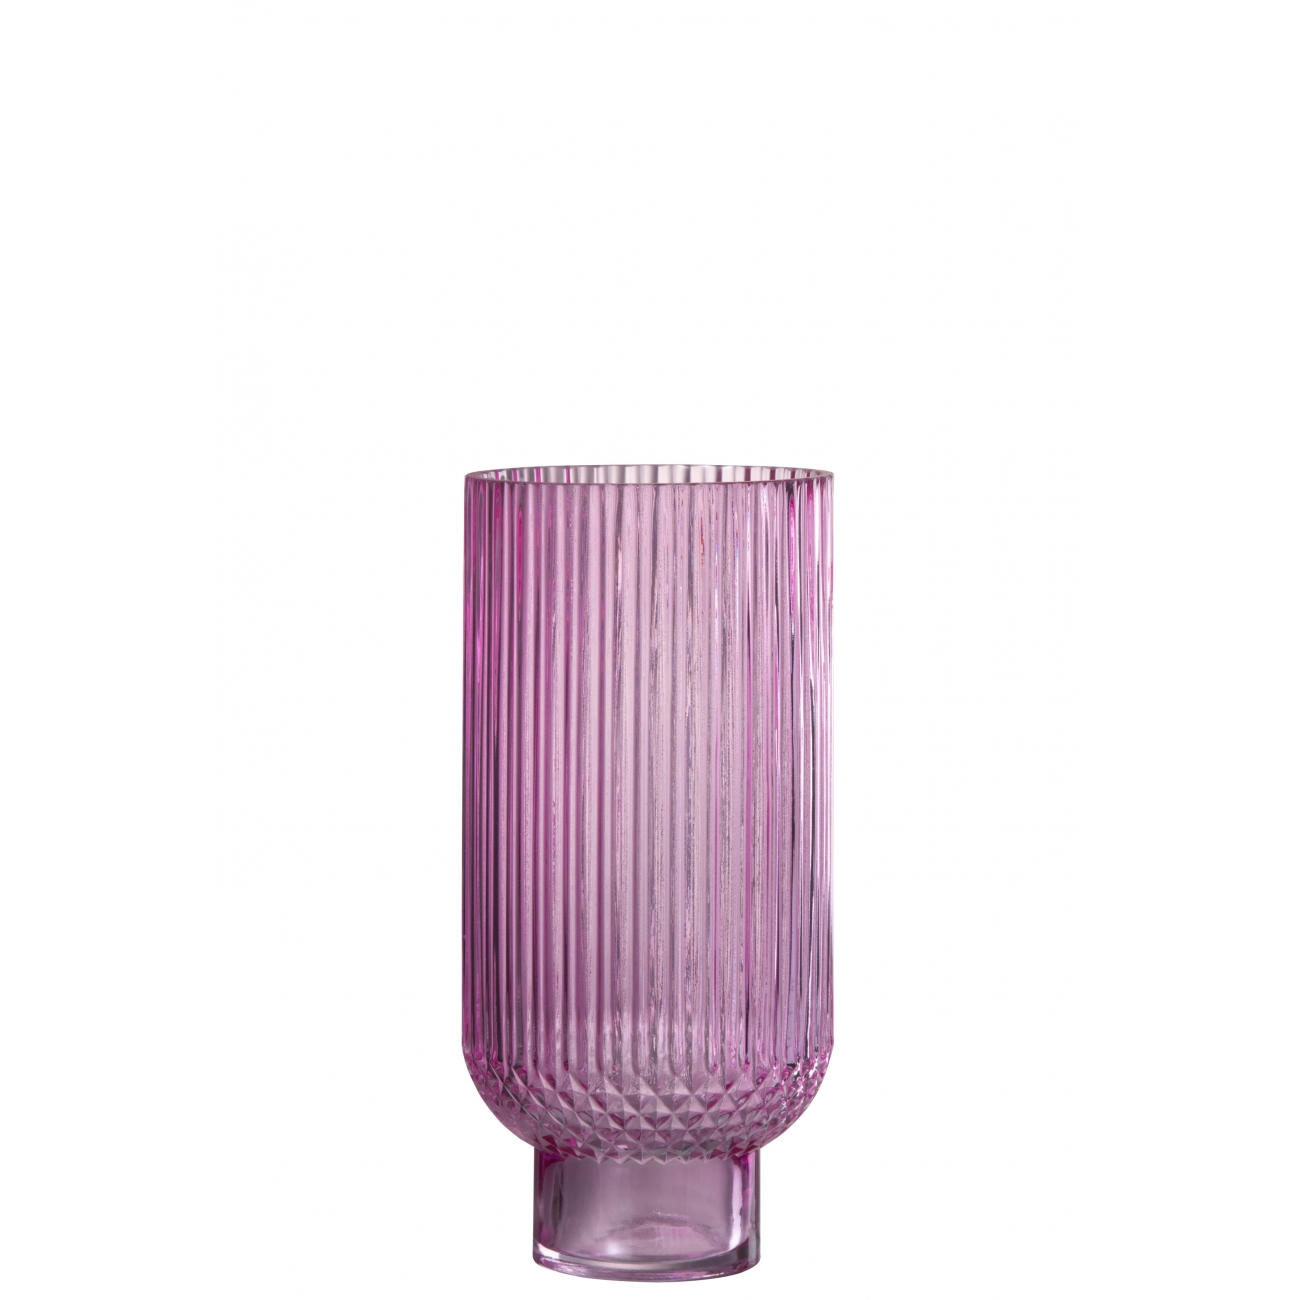 Ваза J-LINE  стеклянная  розовая рельефная 27 см